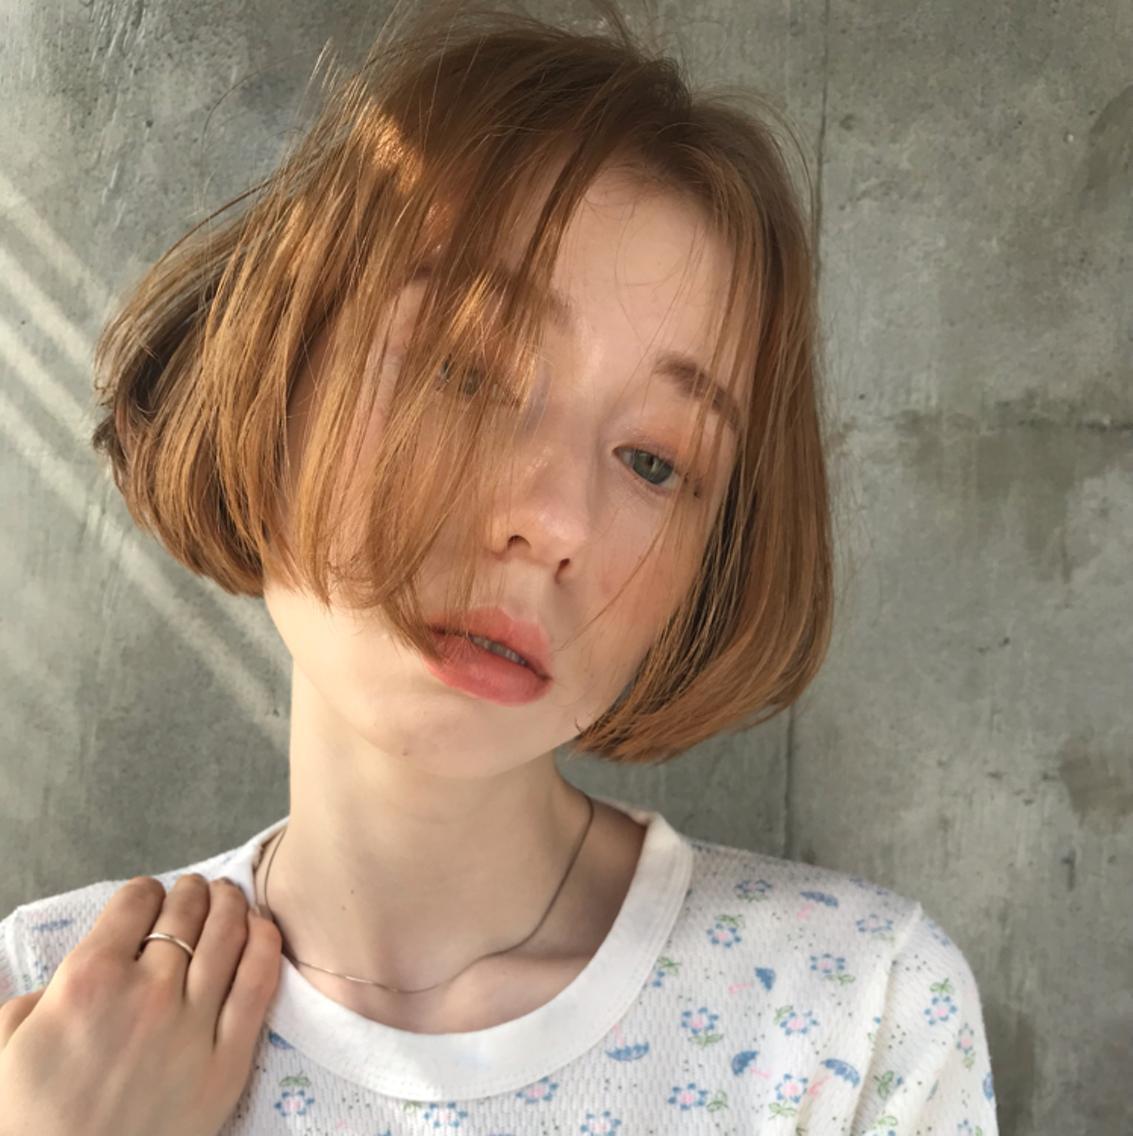 ♥️本日空きあり❤️すぐ予約大歓迎✨ブリーチカラー✨ハイライトカラー✨グラデーションカラー✨グレージュカラー✨